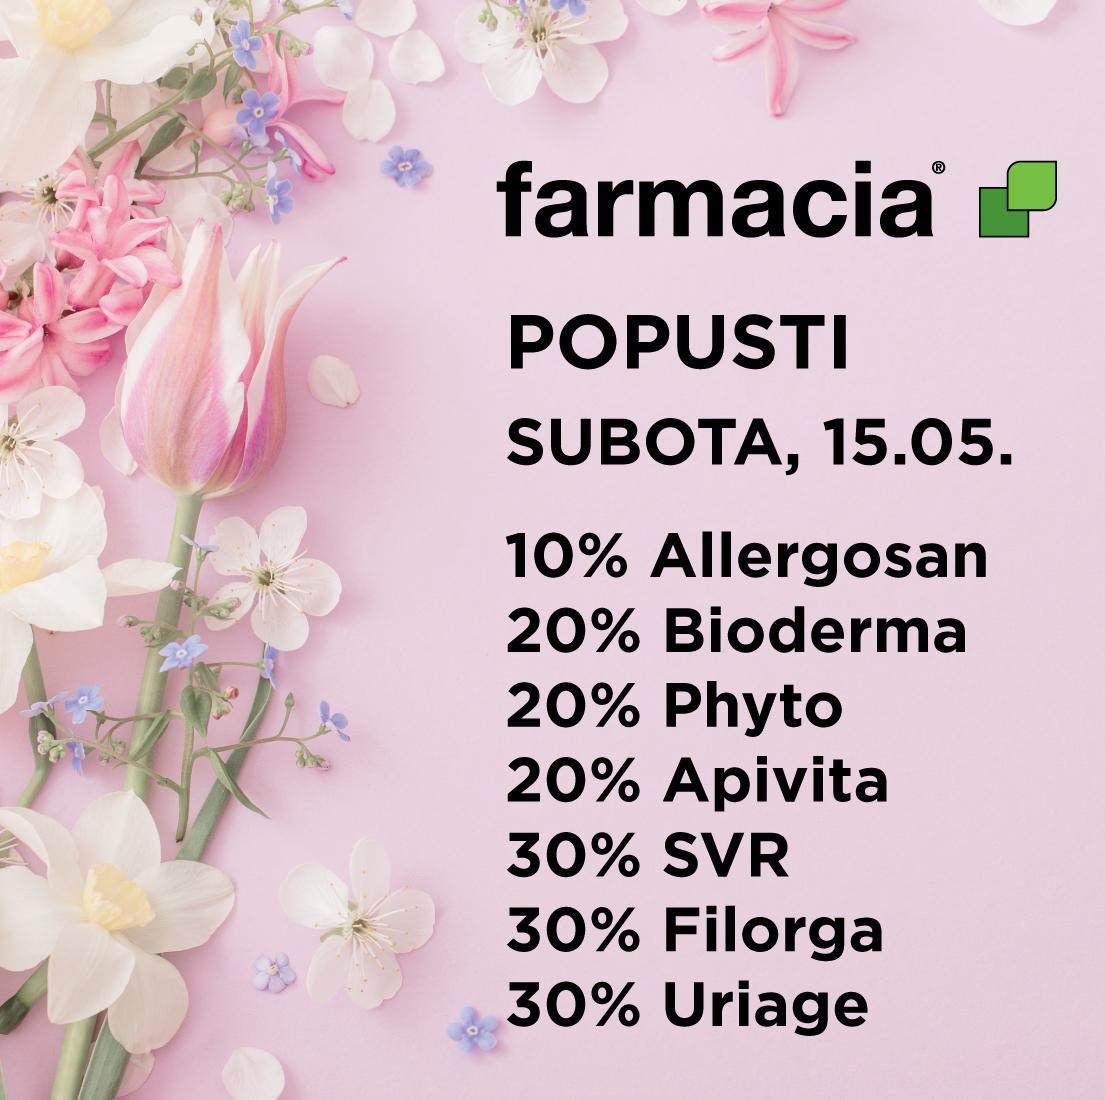 Farmacia – posebni popusti  subota 15.05.